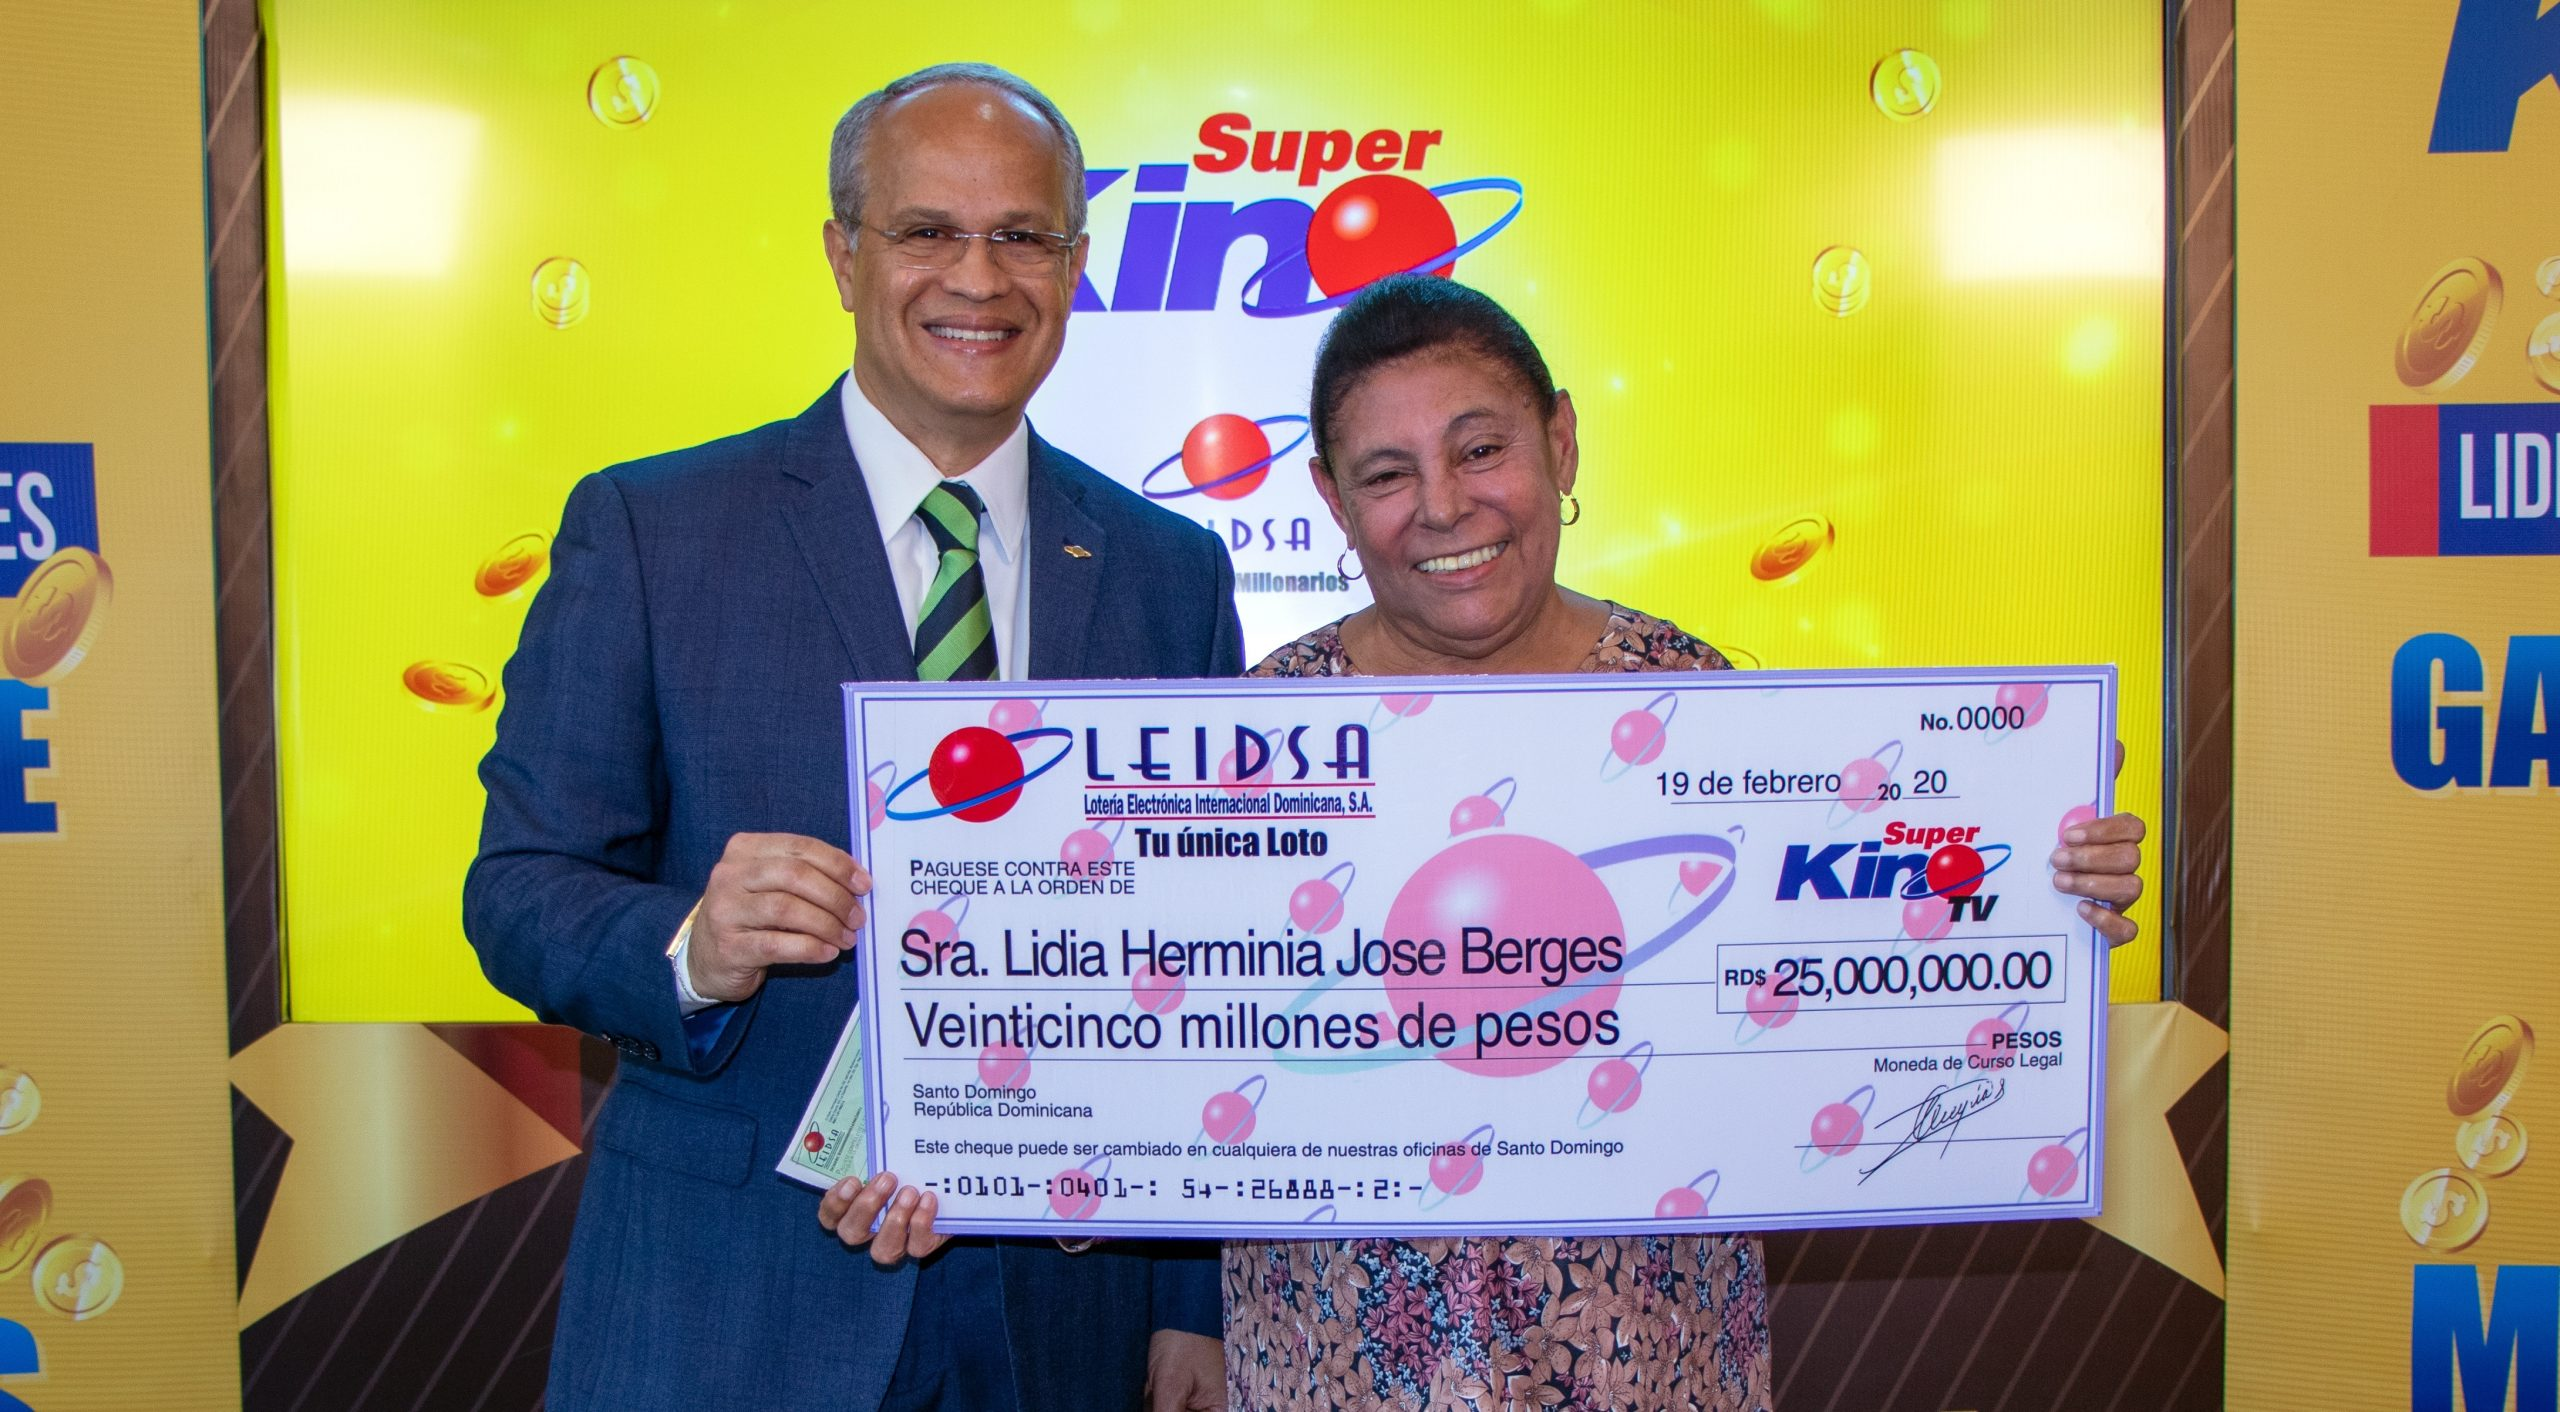 Leidsa Entrega Rd 25 Millones A Ganadora Del Super Kino Tv